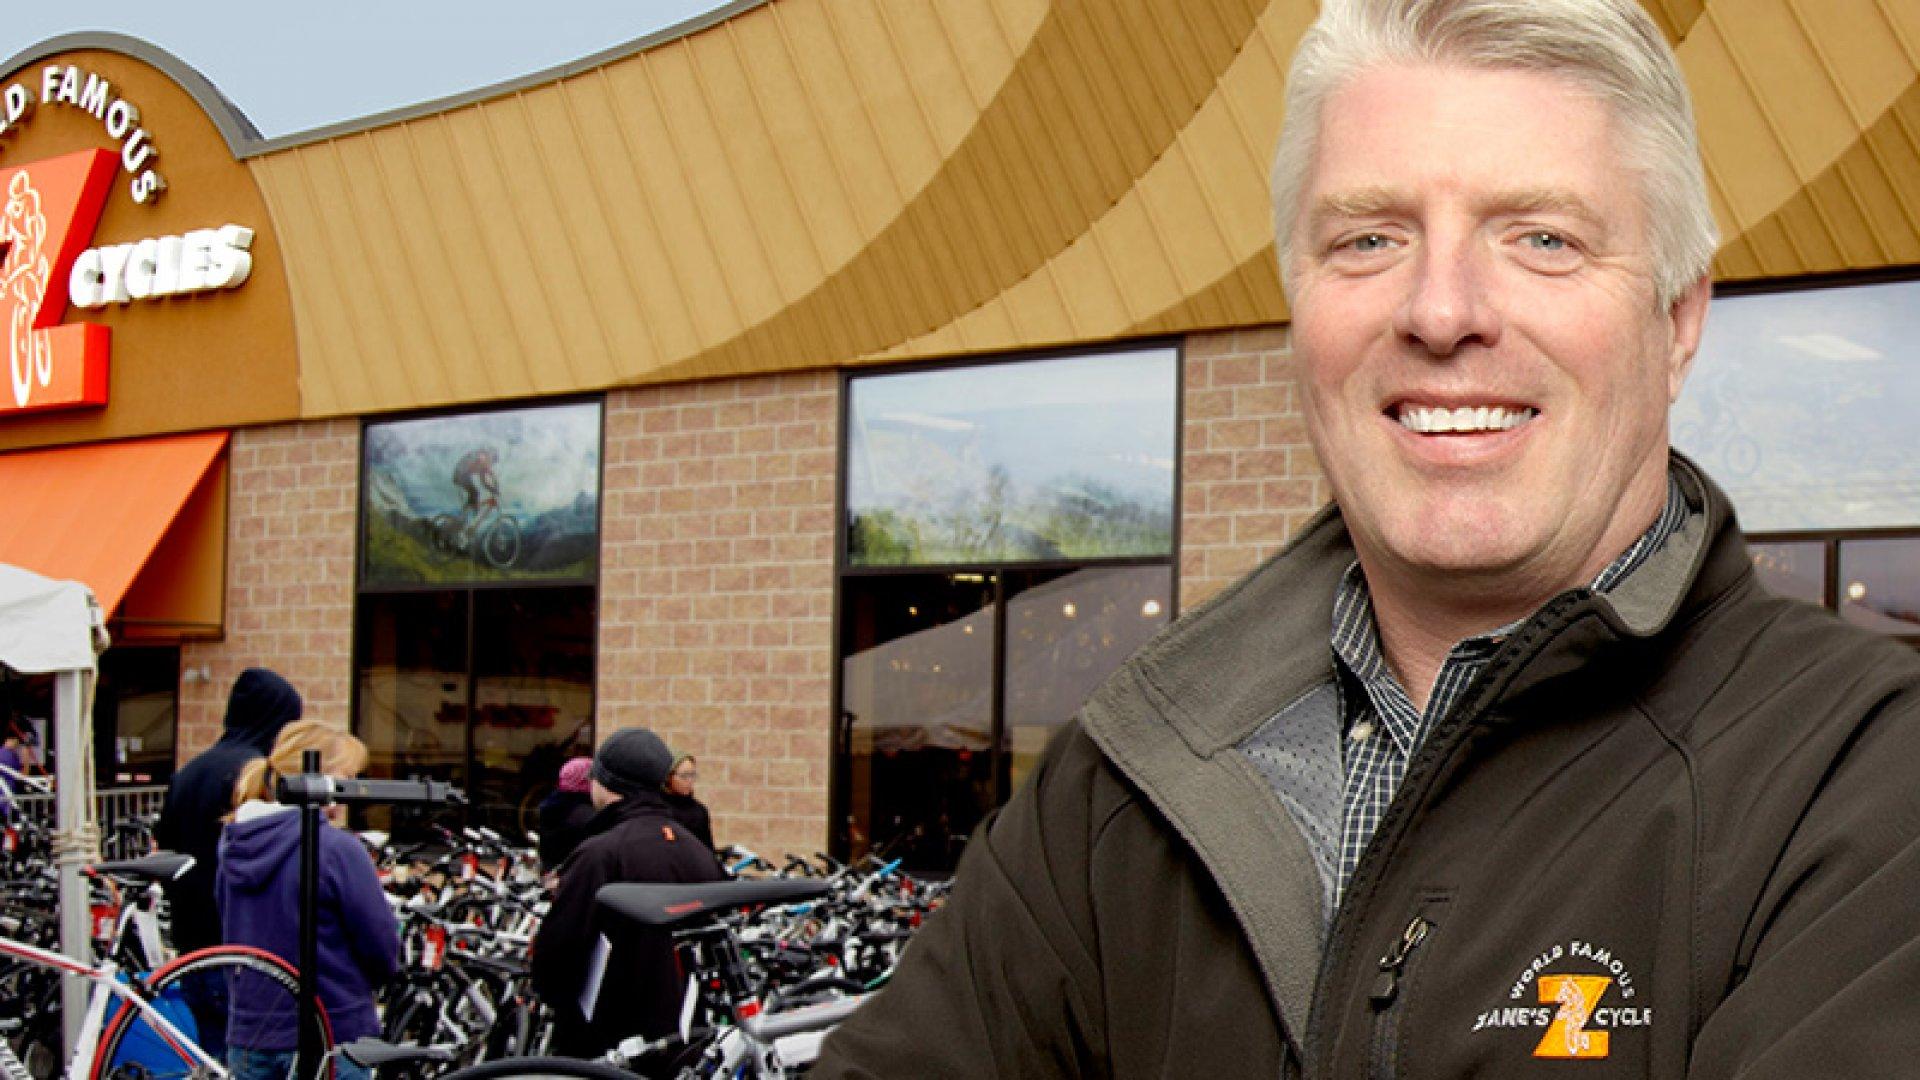 Trek Bike Recall Is a Case Study in Crisis Response